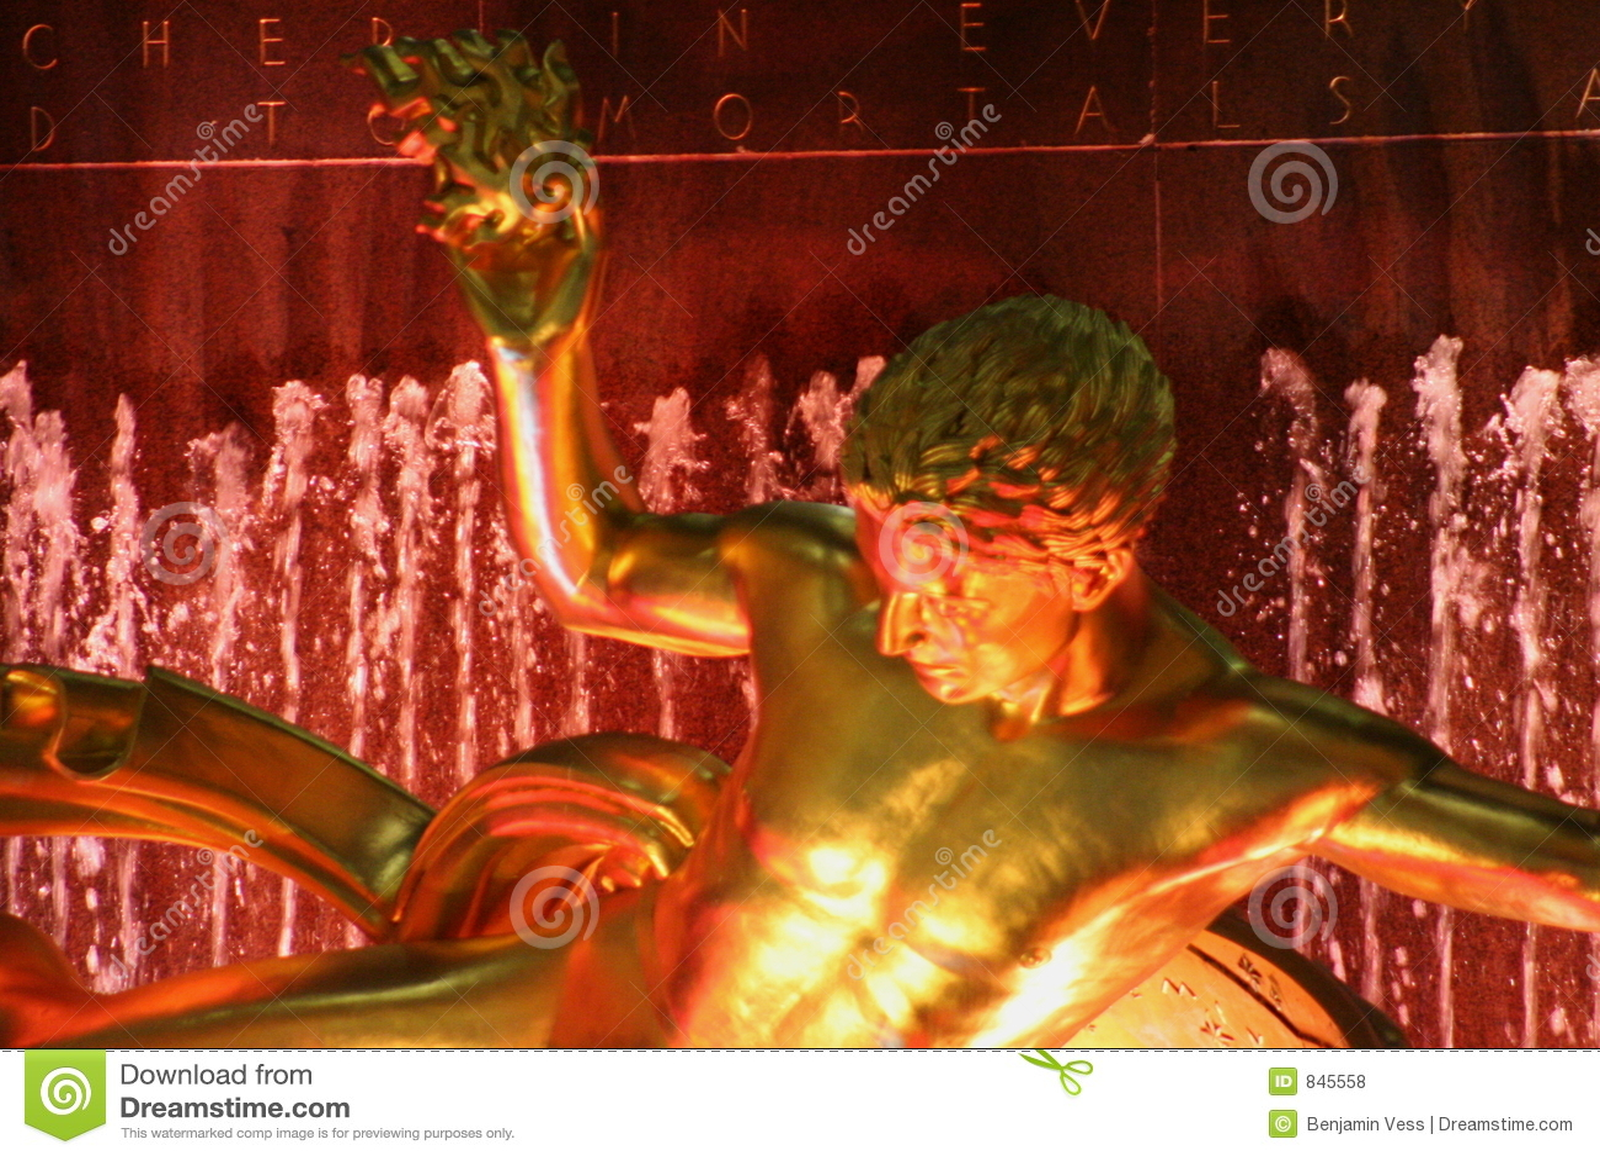 Promethus at Rockefeller Plaza